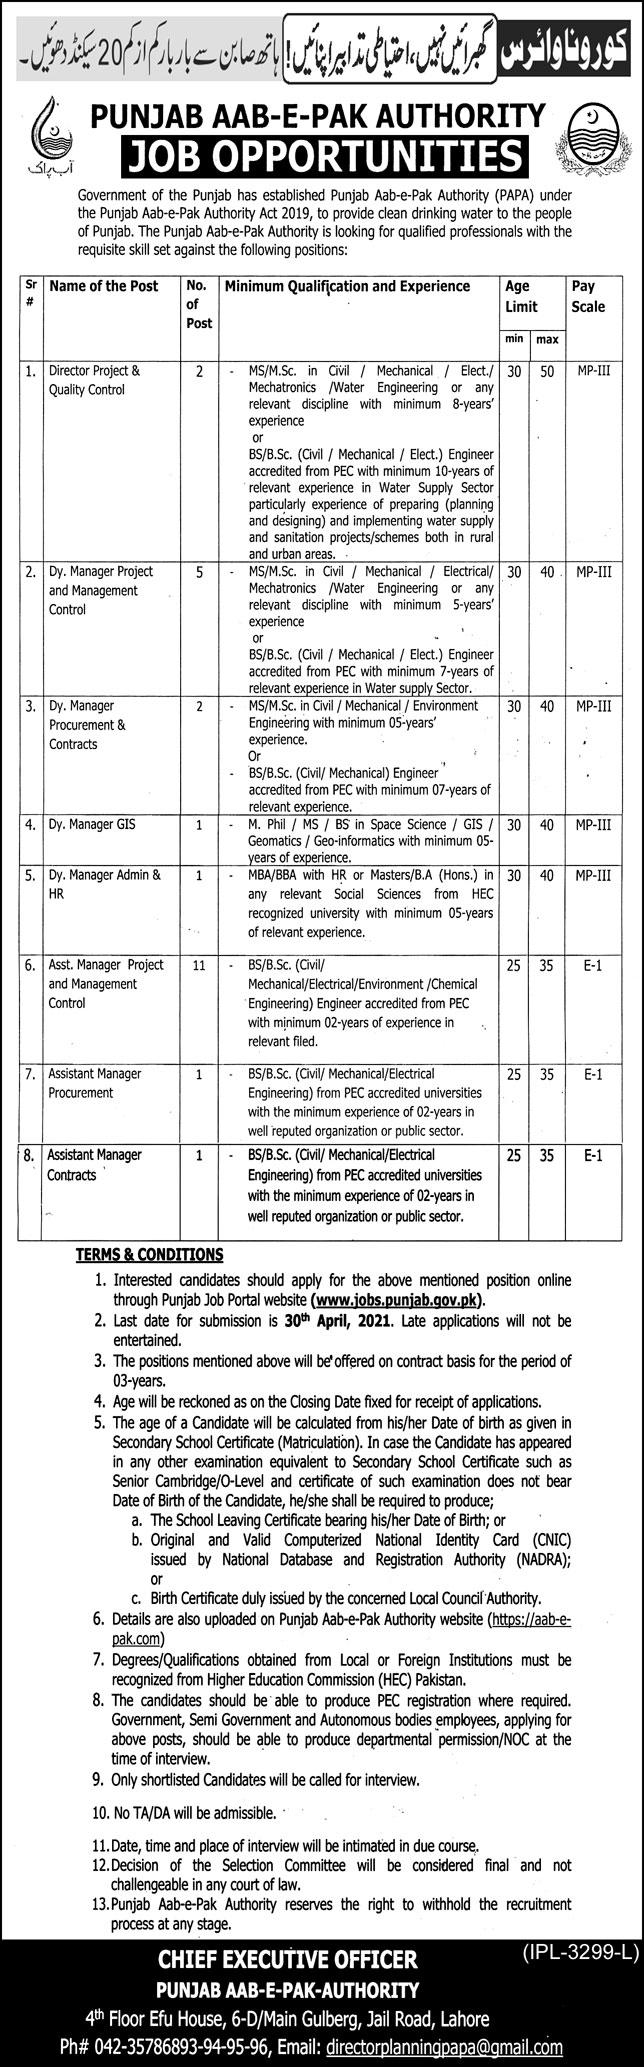 Punjab AAB E PAK Authority Jobs opportunities 2021